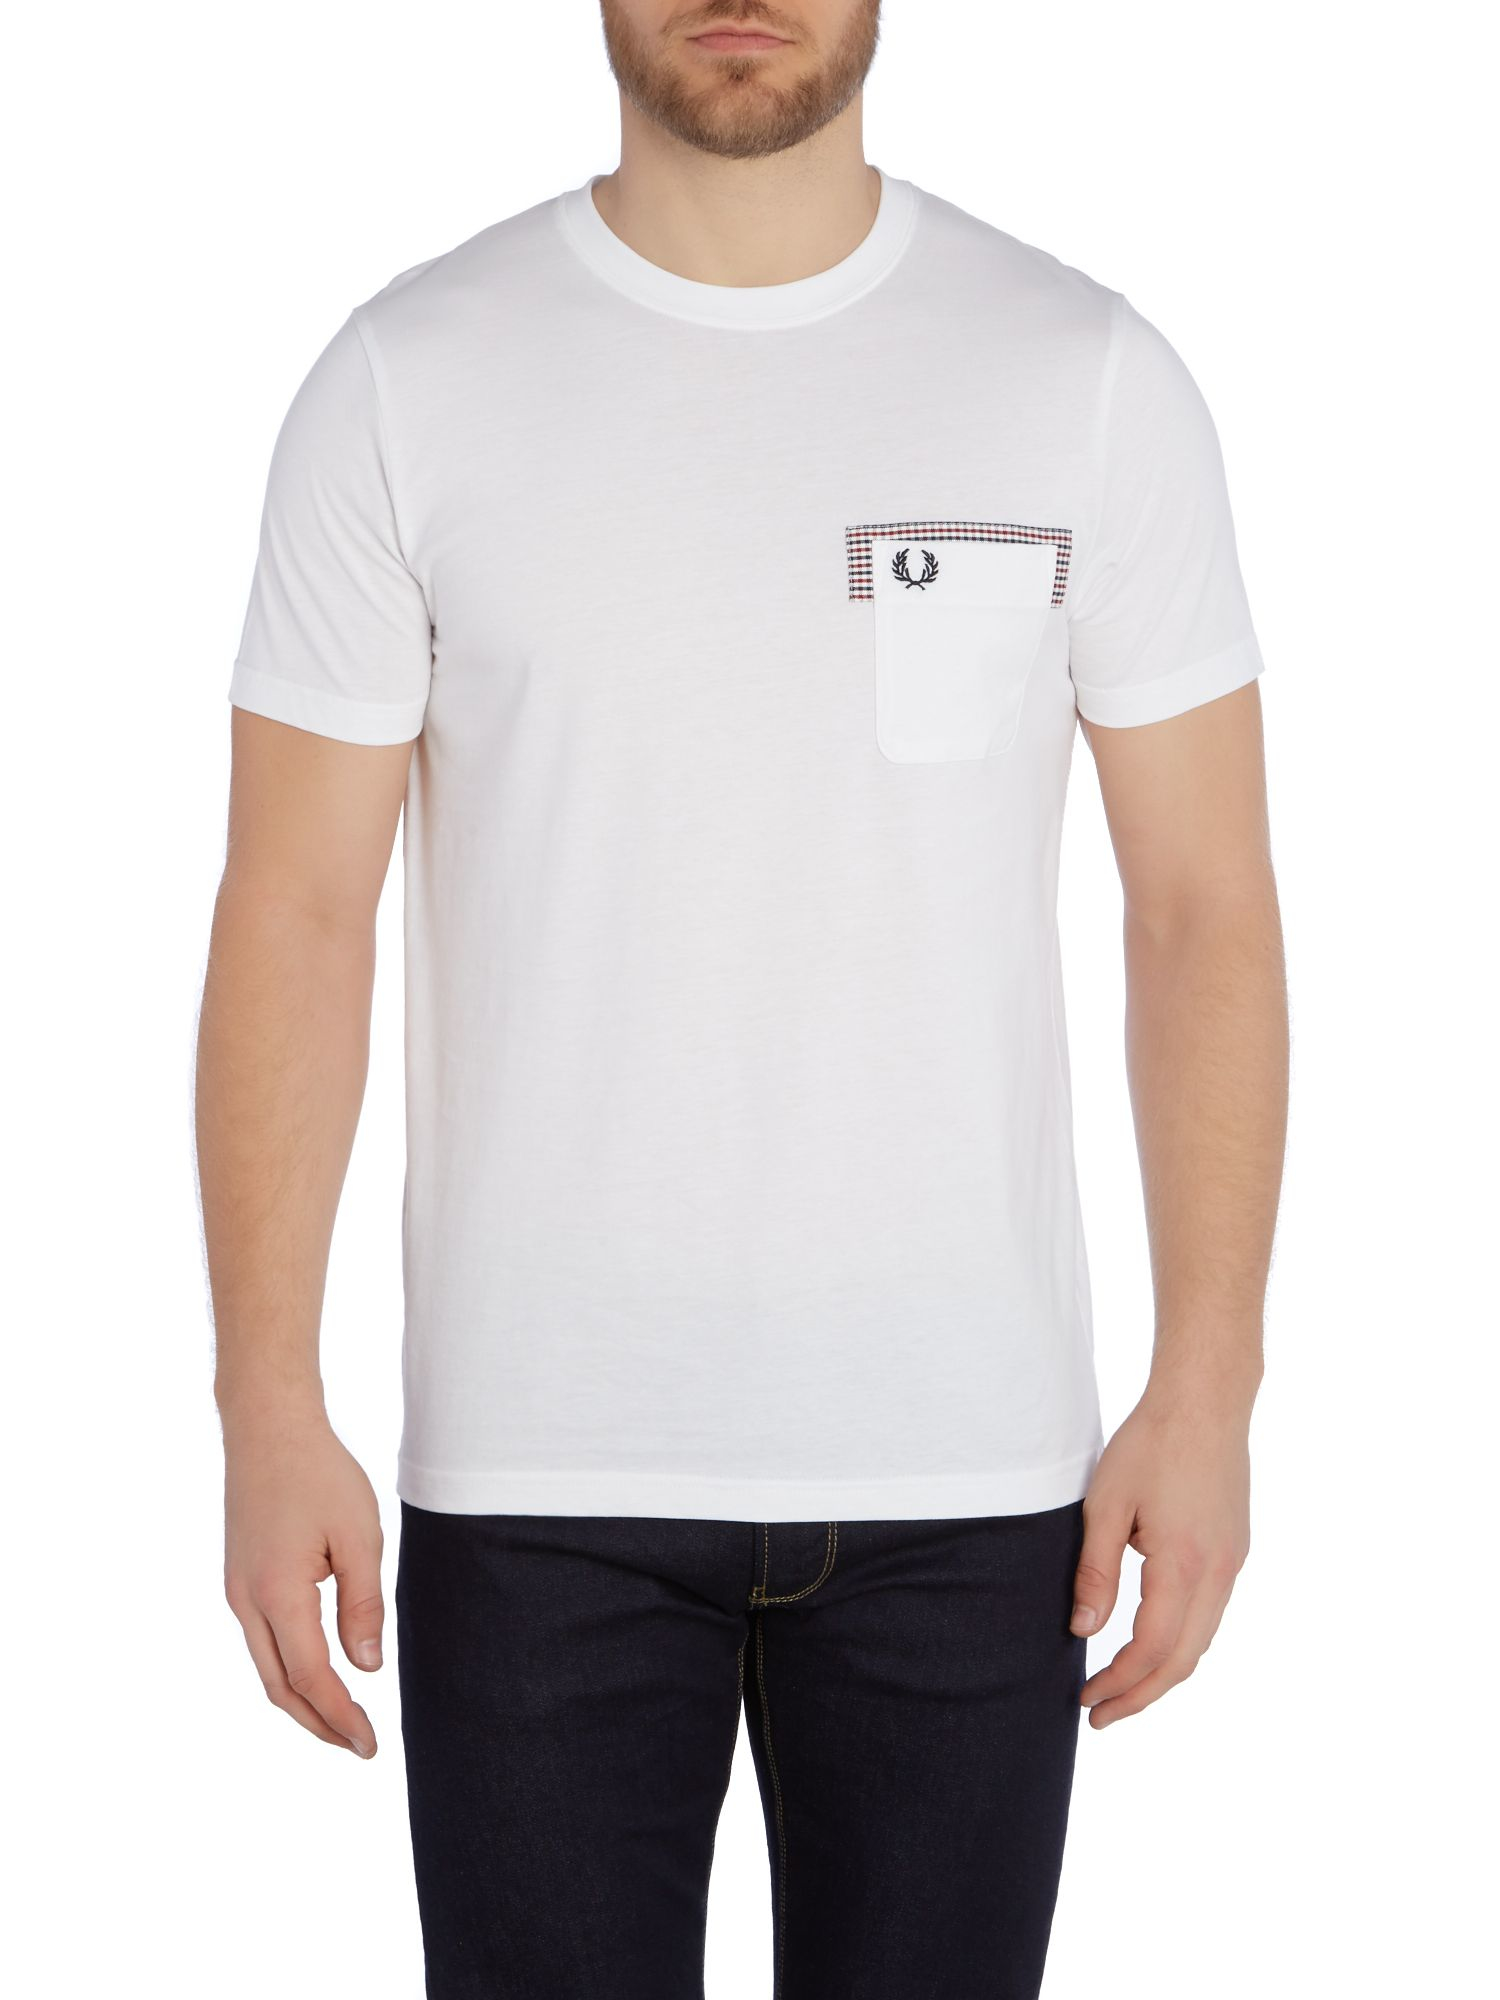 fred perry gingham trim pocket crew neck t shirt in white for men. Black Bedroom Furniture Sets. Home Design Ideas